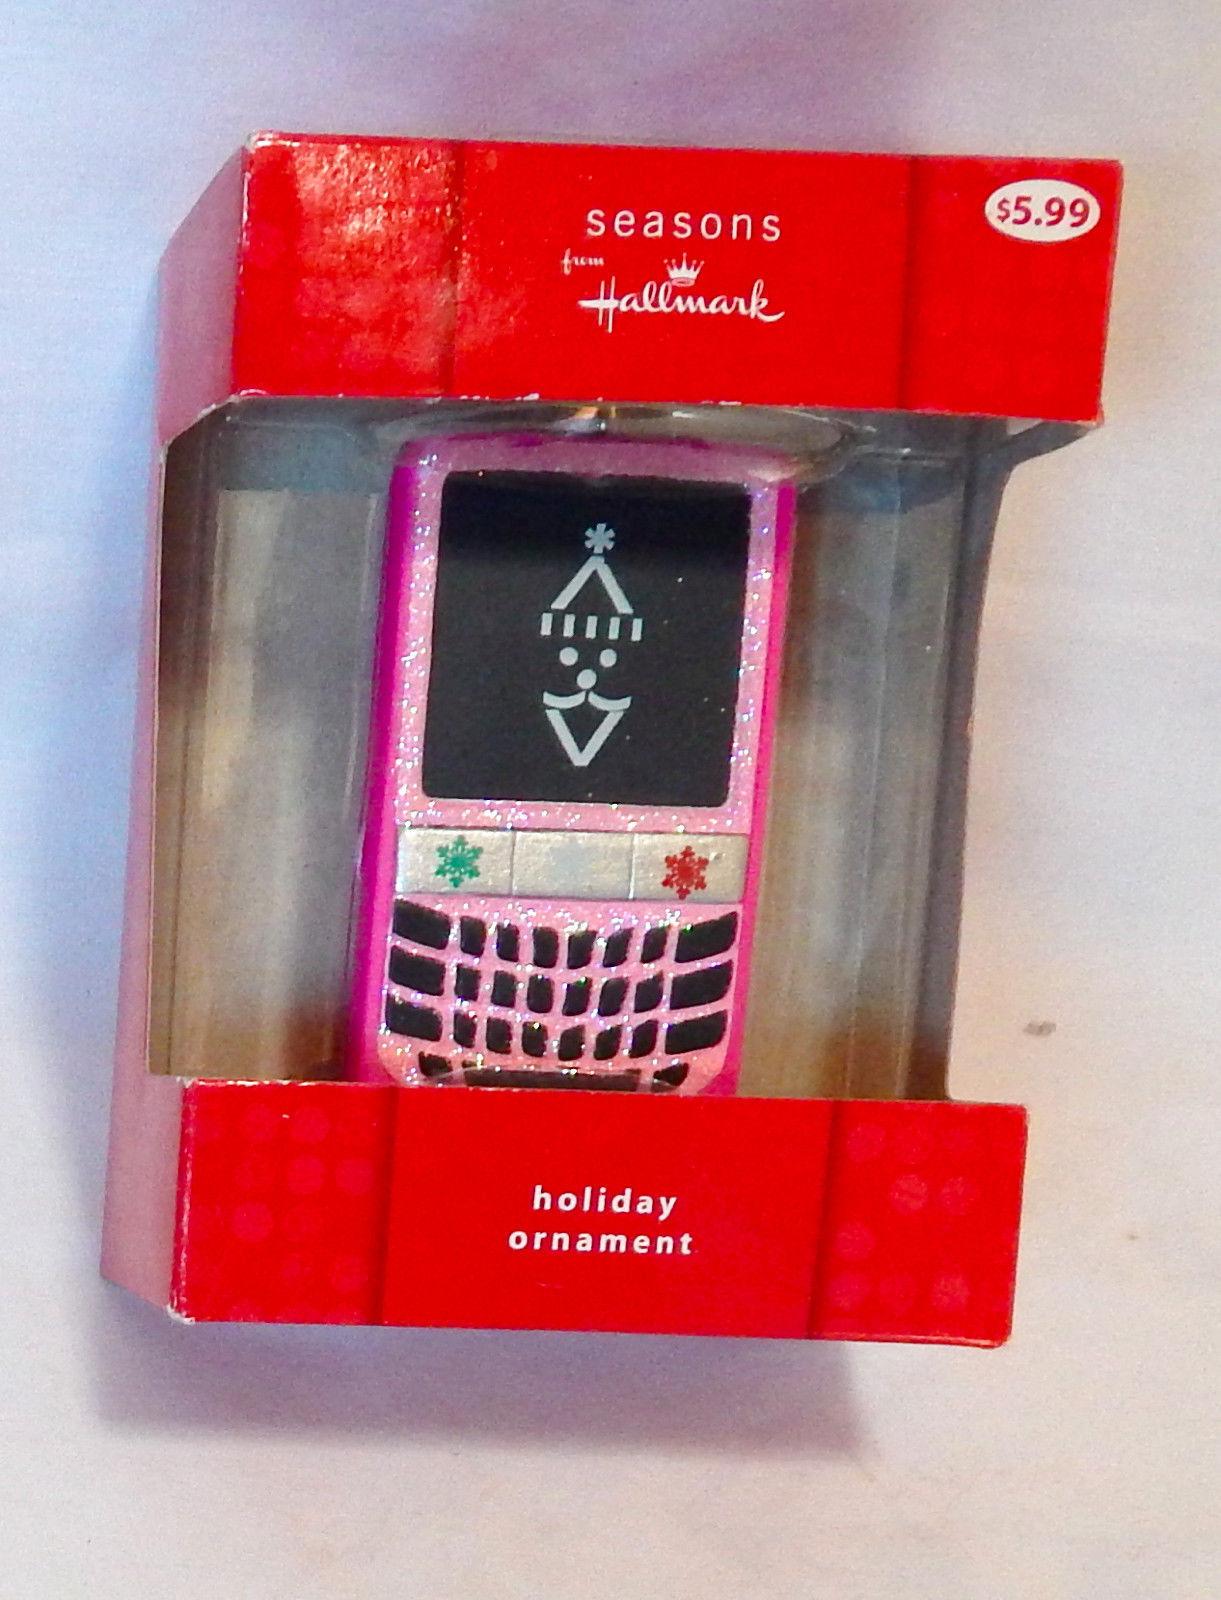 "Christmas Hallmark Seasons Cell Phone Ornament 3"" x 2"" Pink 1HCM9613 27S"